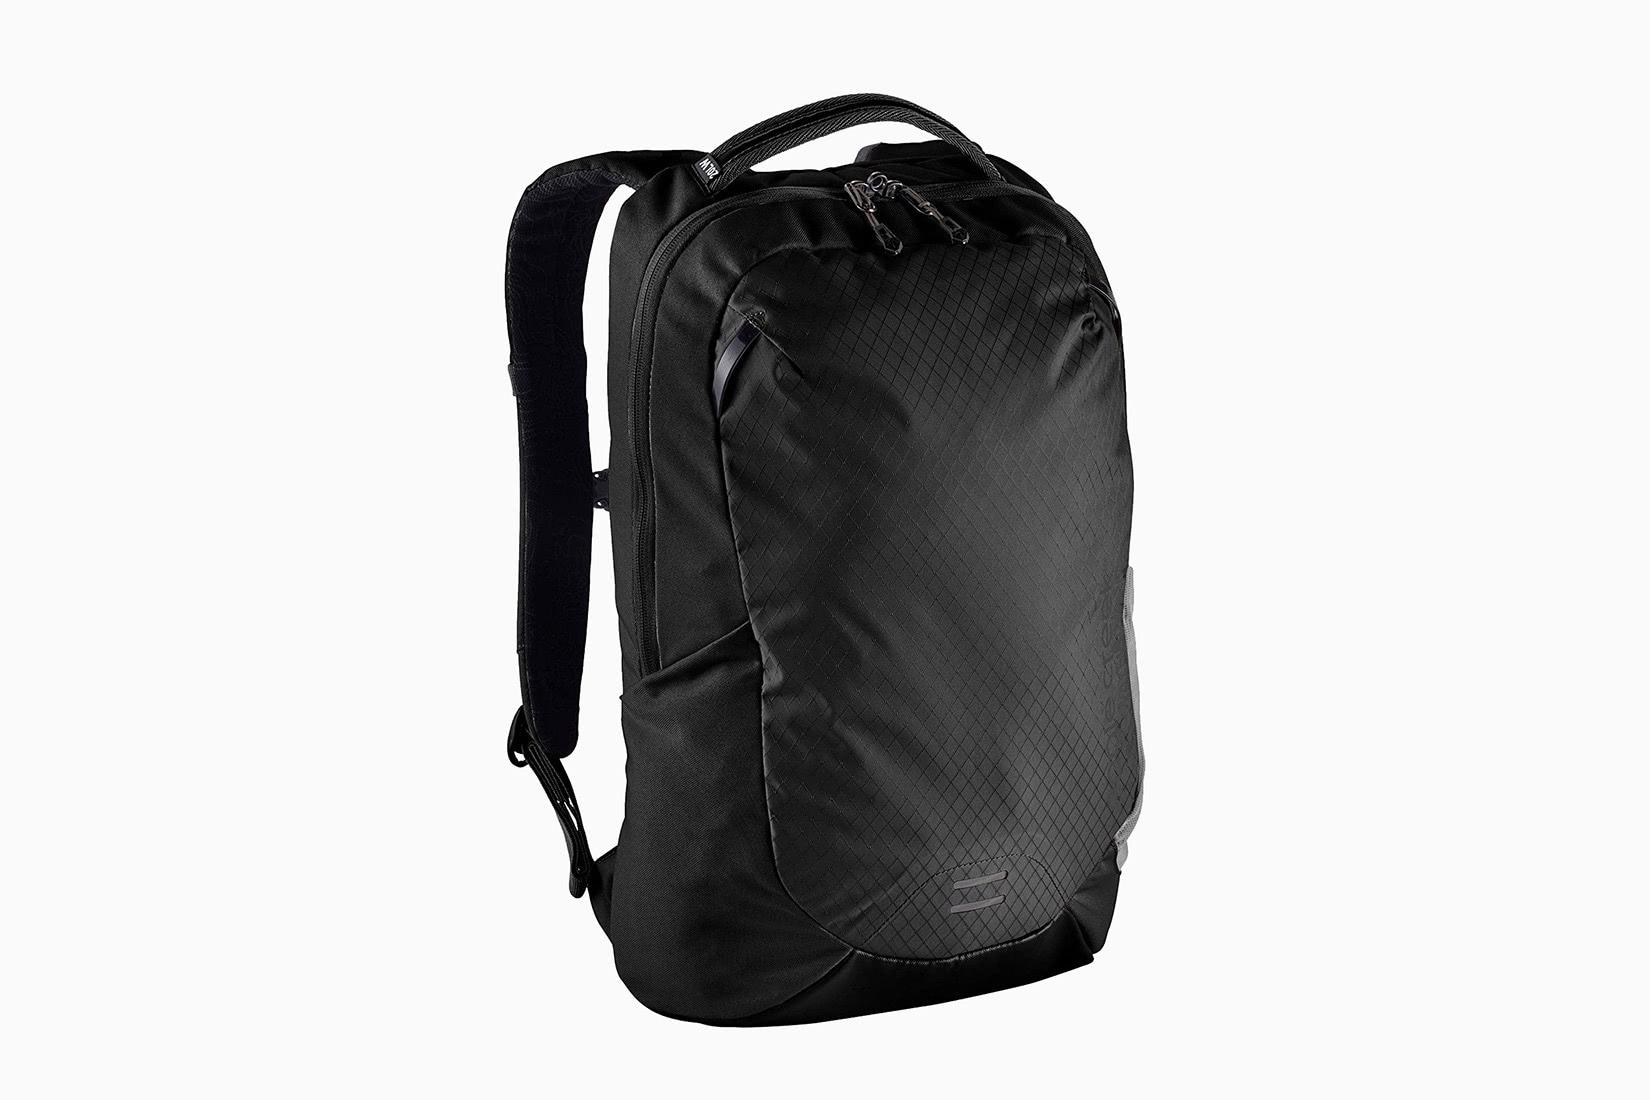 best edc backpack eagle creek wayfinde - Luxe Digital